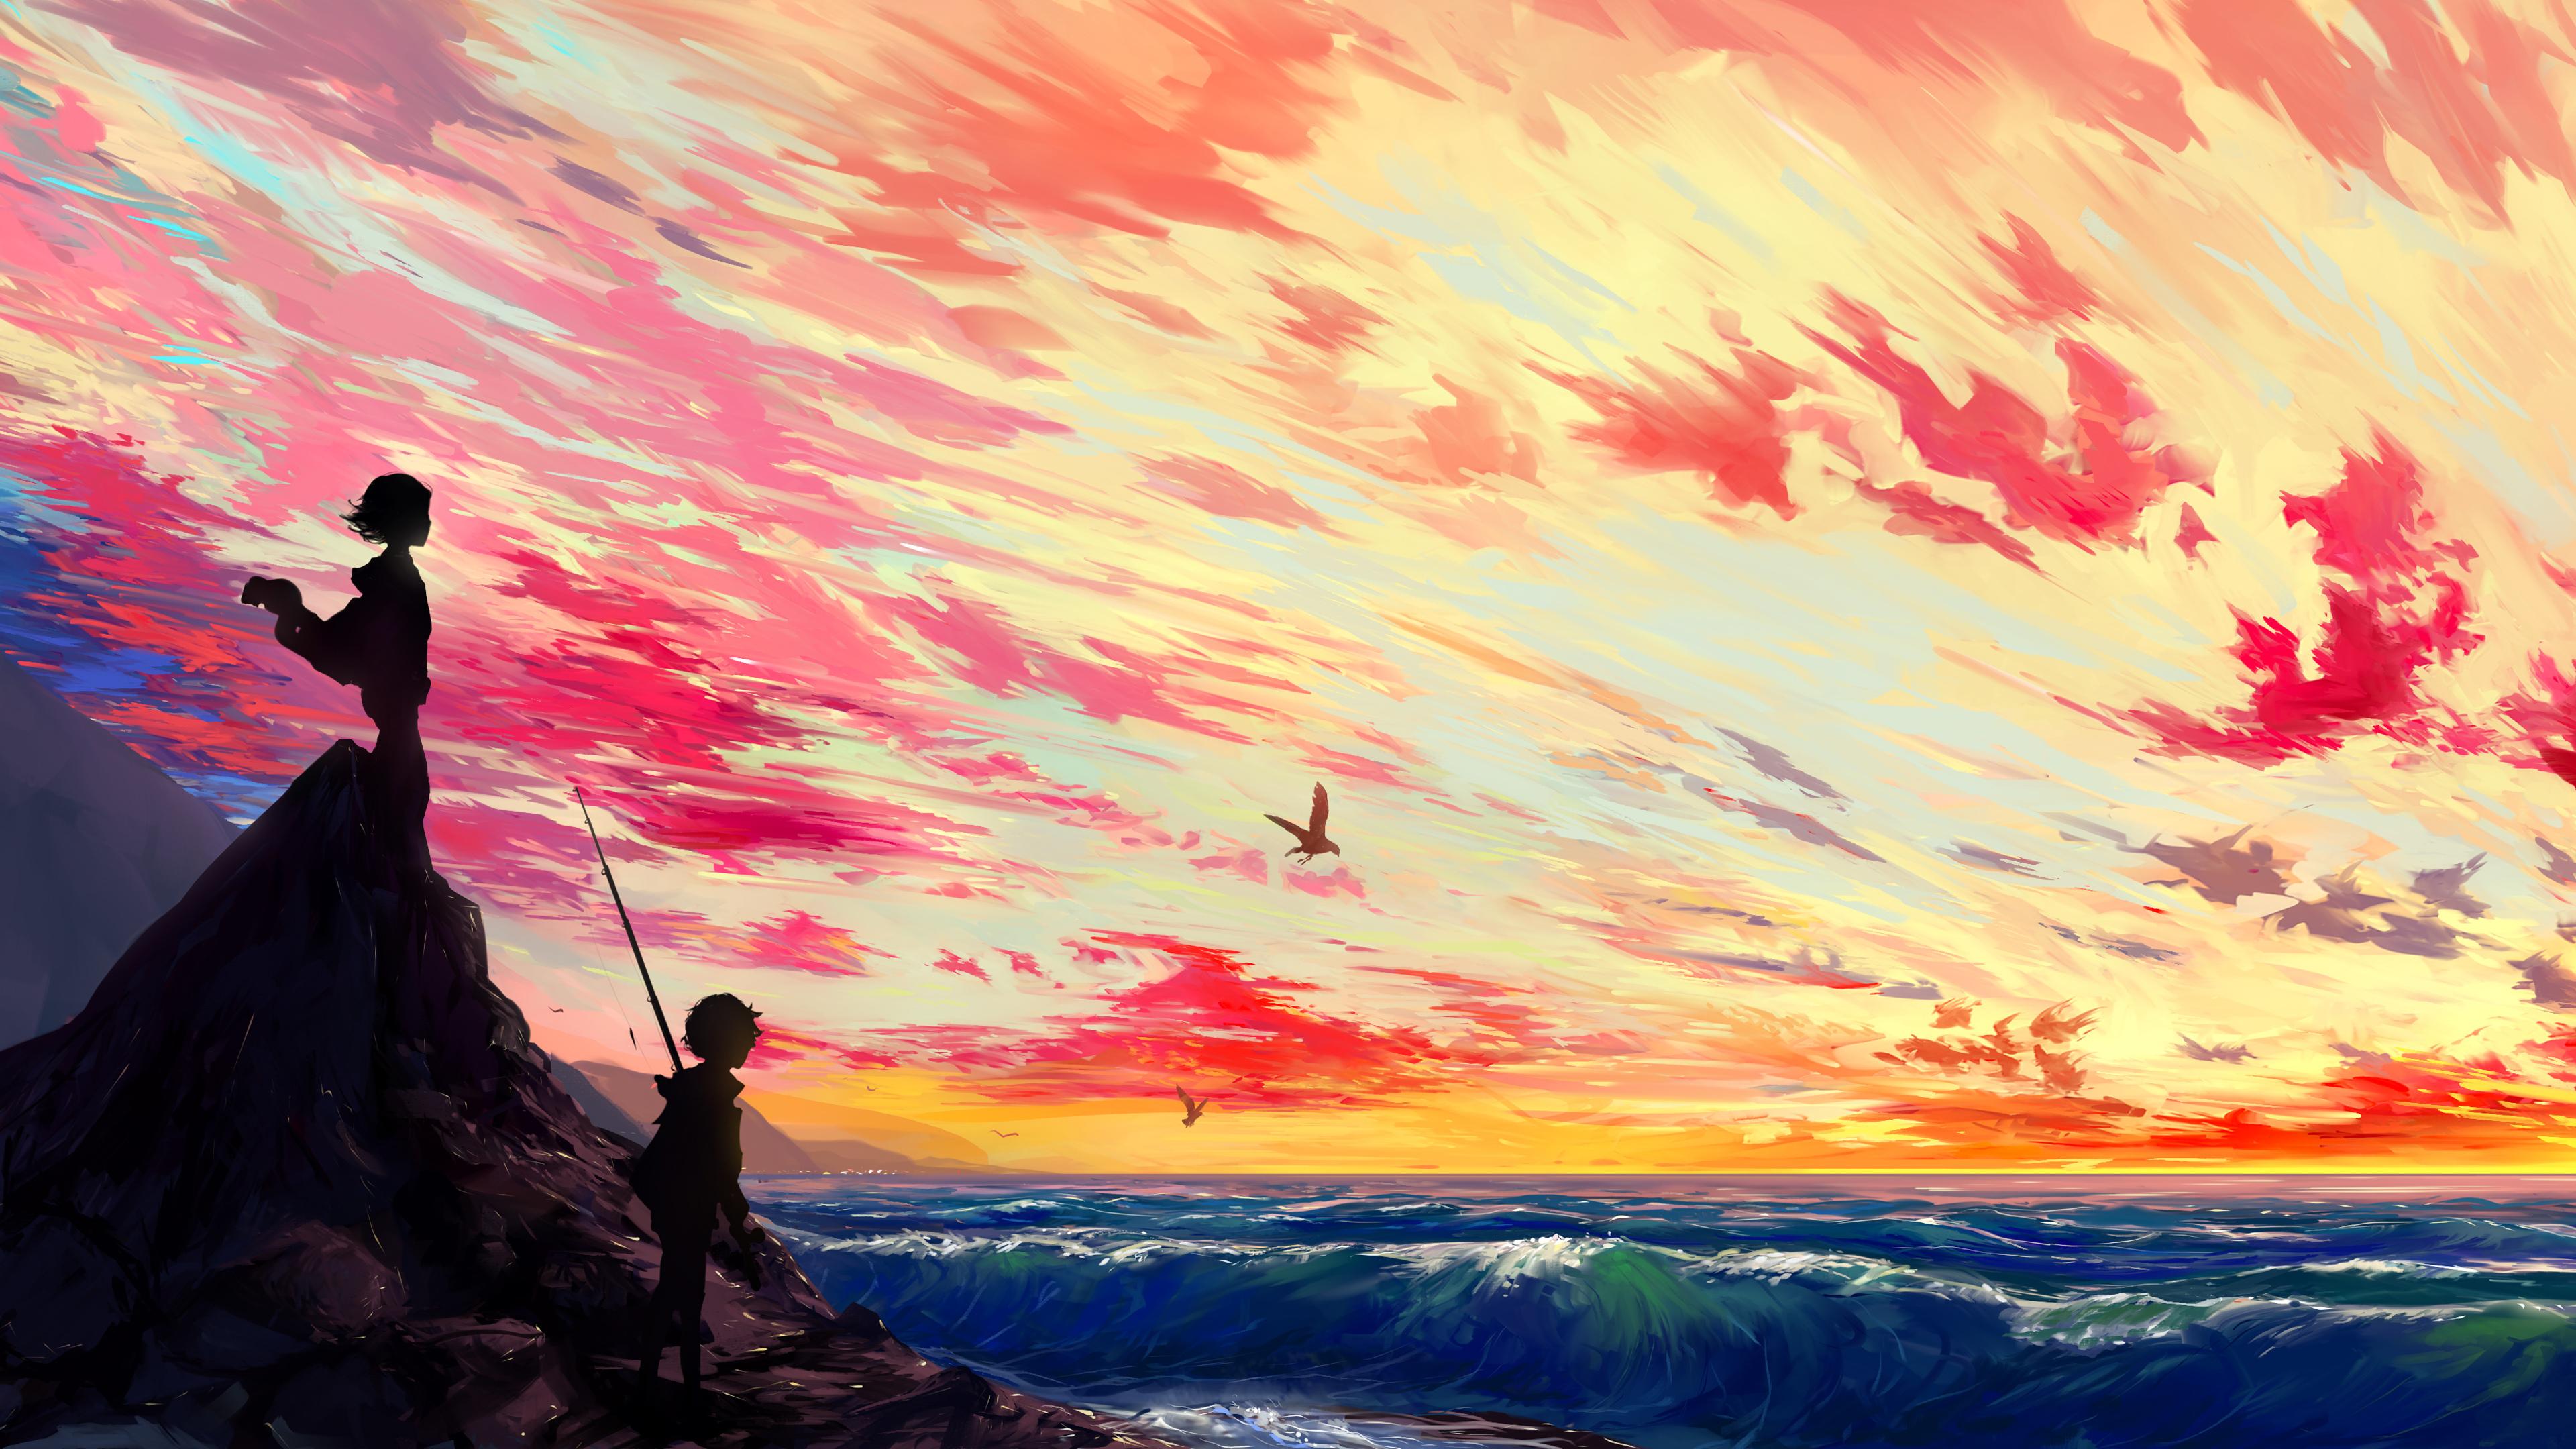 anime art 5k 1541973653 - Anime Art 5k - hd-wallpapers, drawing wallpapers, digital art wallpapers, artwork wallpapers, artist wallpapers, anime wallpapers, 5k wallpapers, 4k-wallpapers